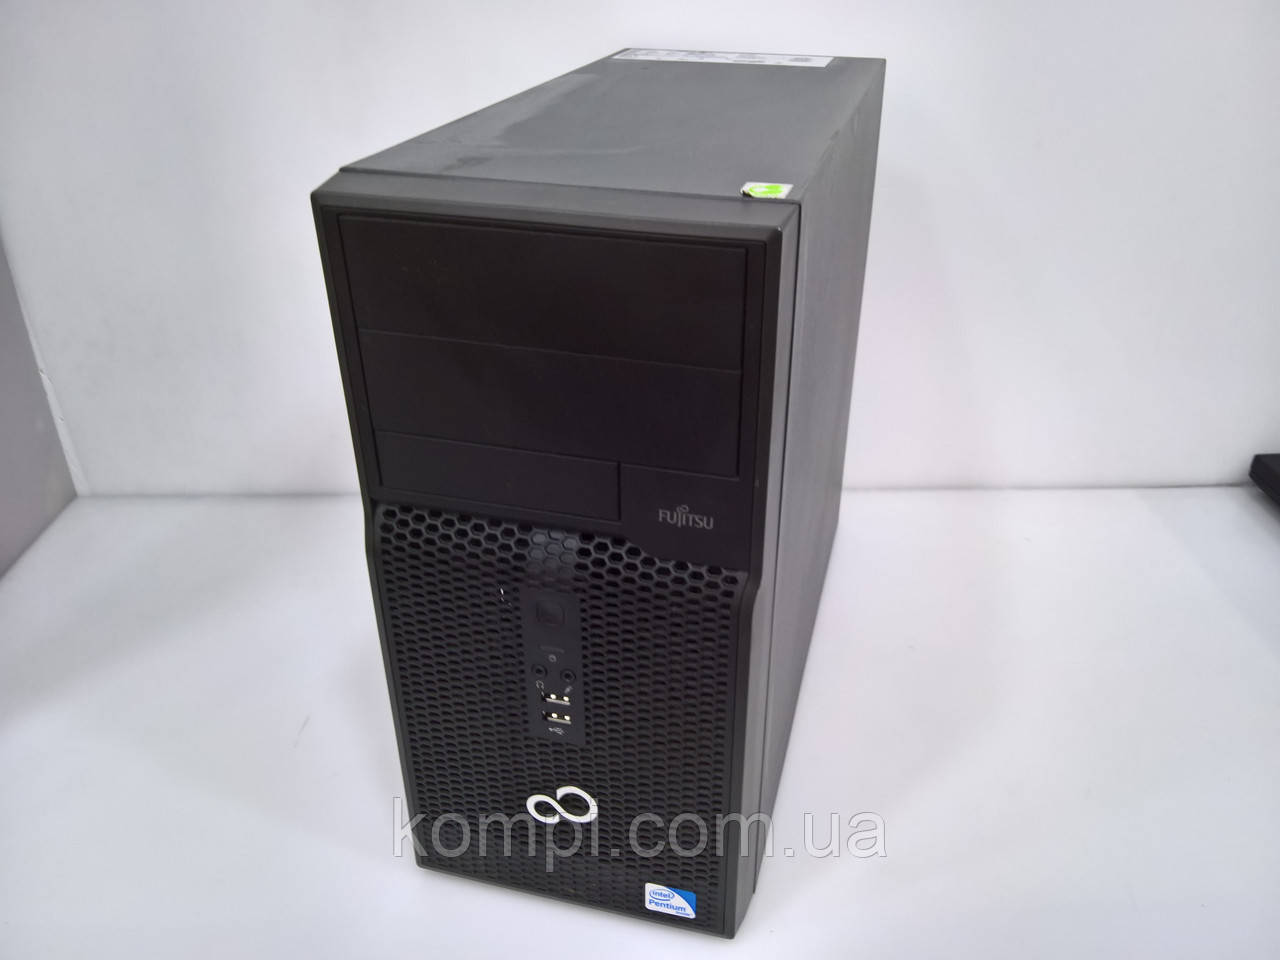 Системний блок Fujitsu P500 E85+ i5 2400 (Intel i5 2400/4Gb DDR3/Video INTG/No- HDD/ WIN 7)